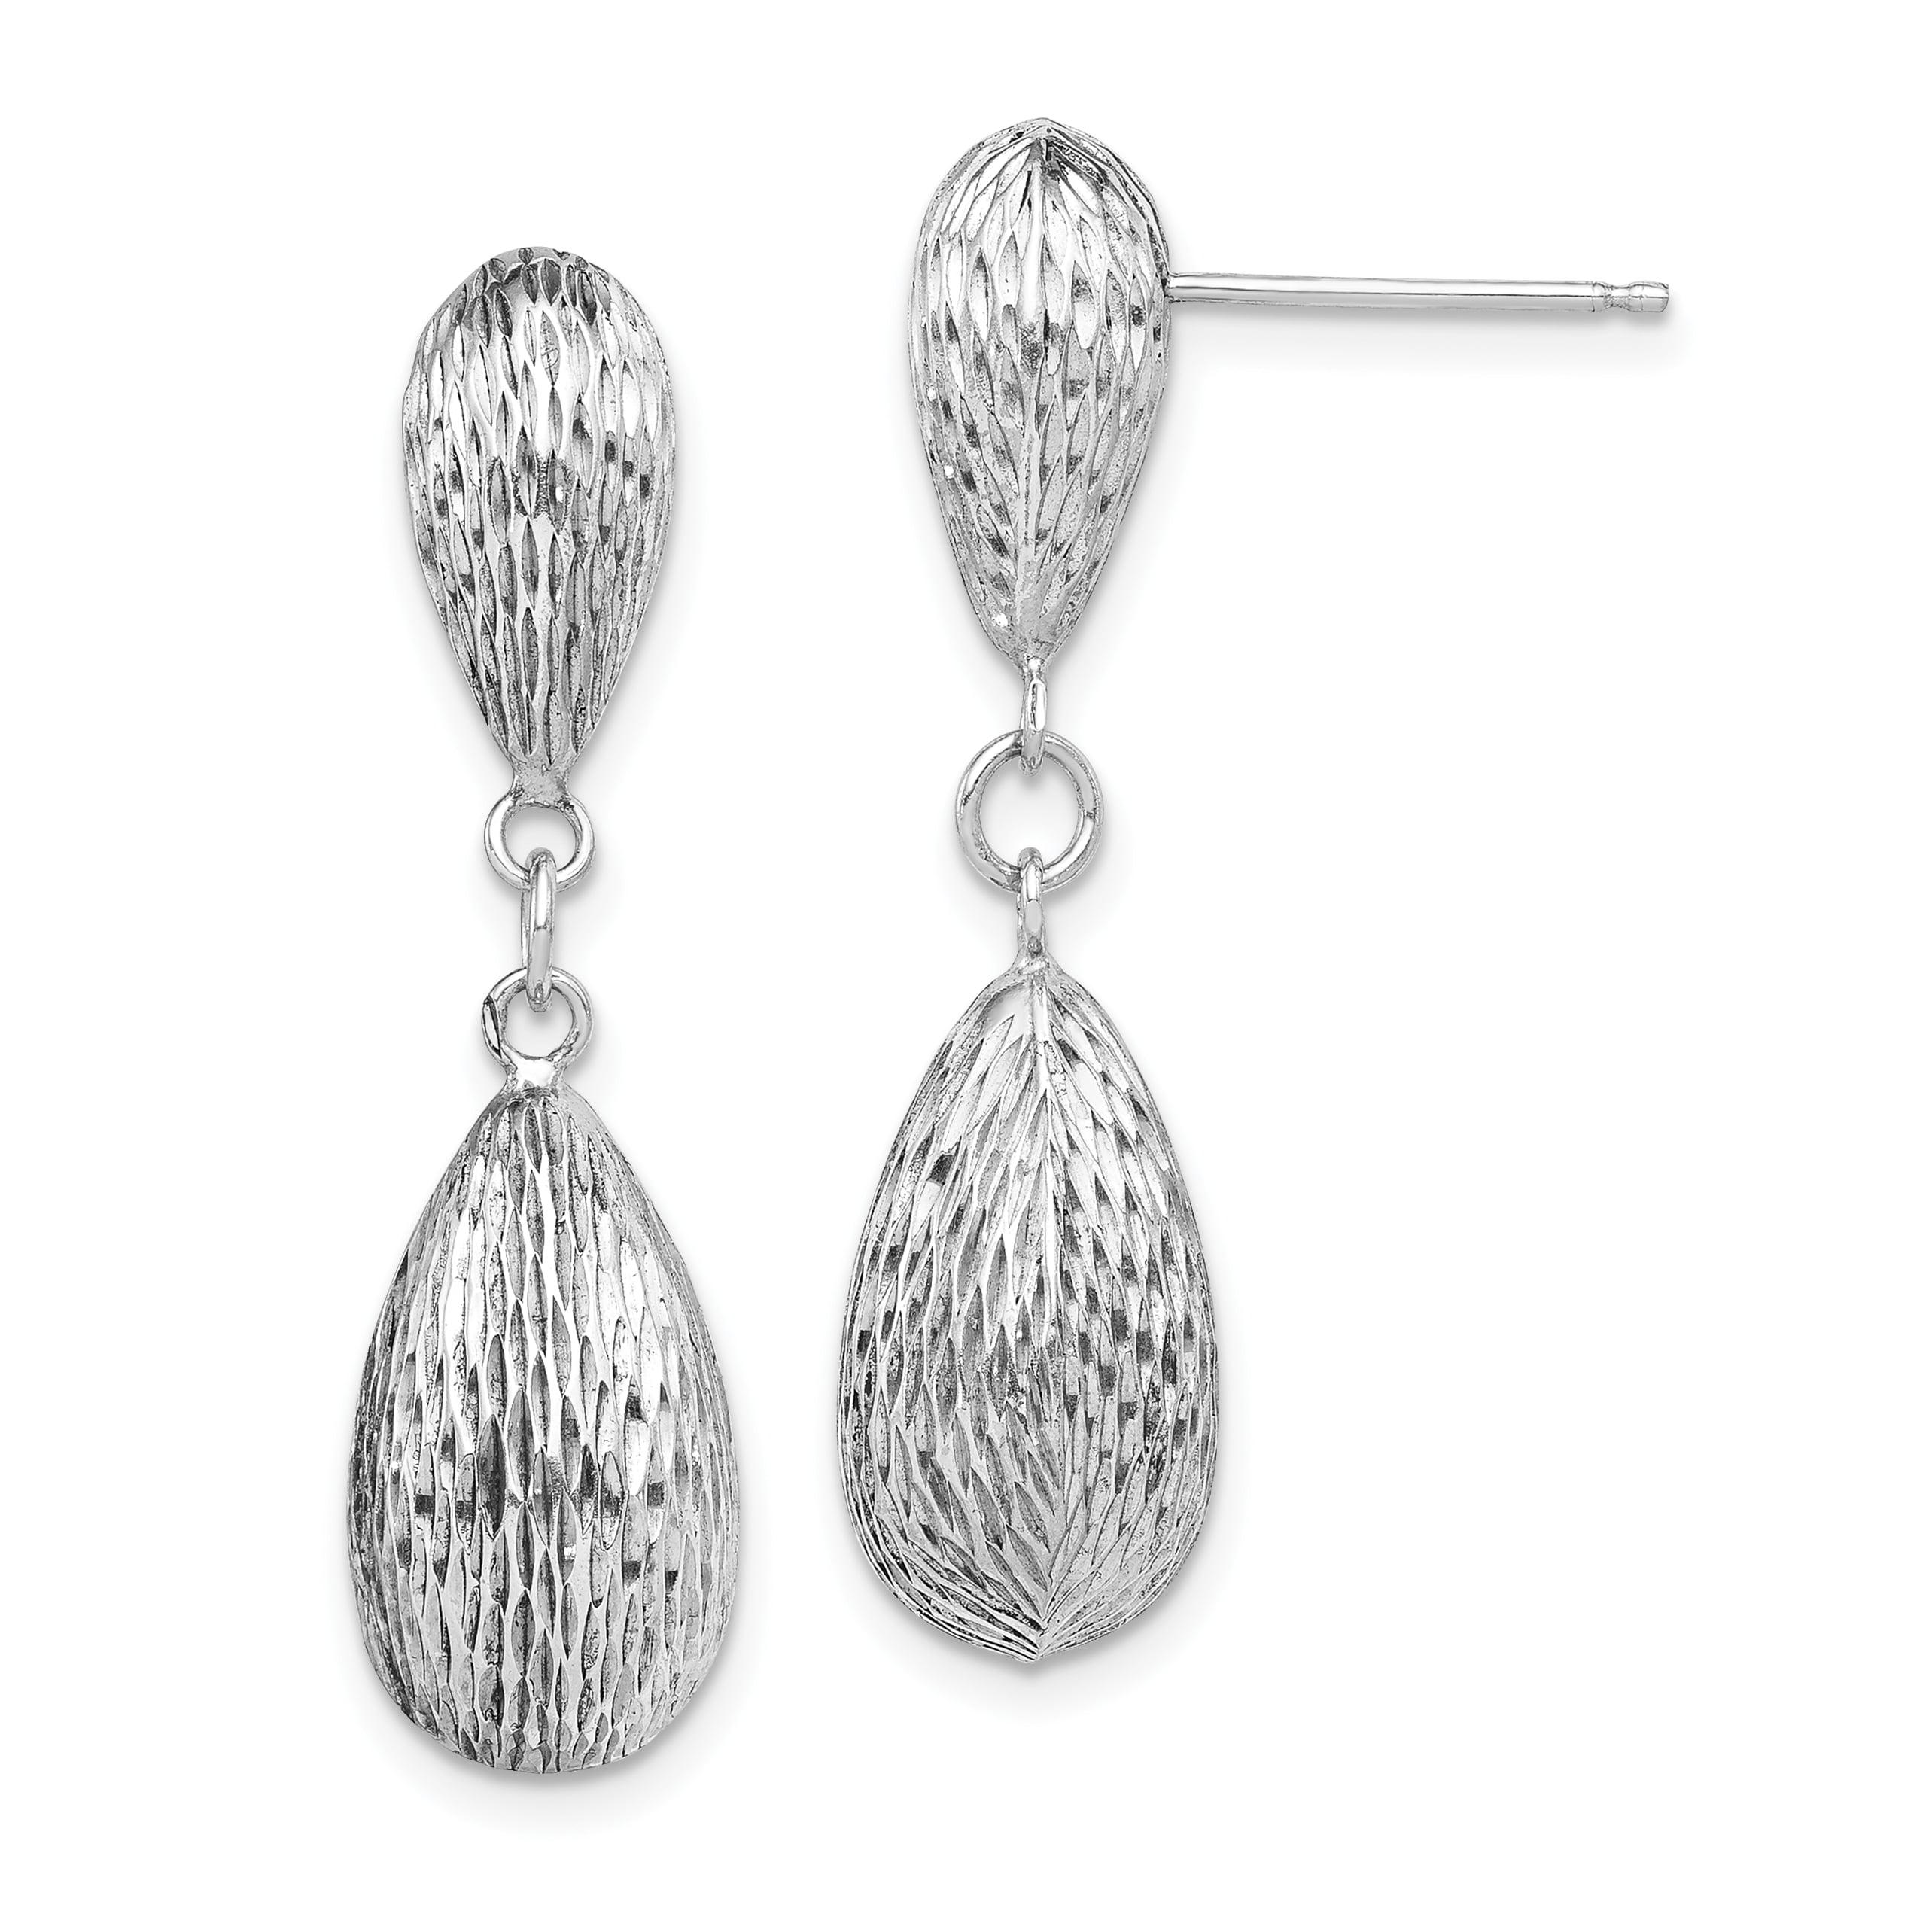 Solid 925 Sterling Silver Dolphin//Heart Earrings 8mm x 9mm